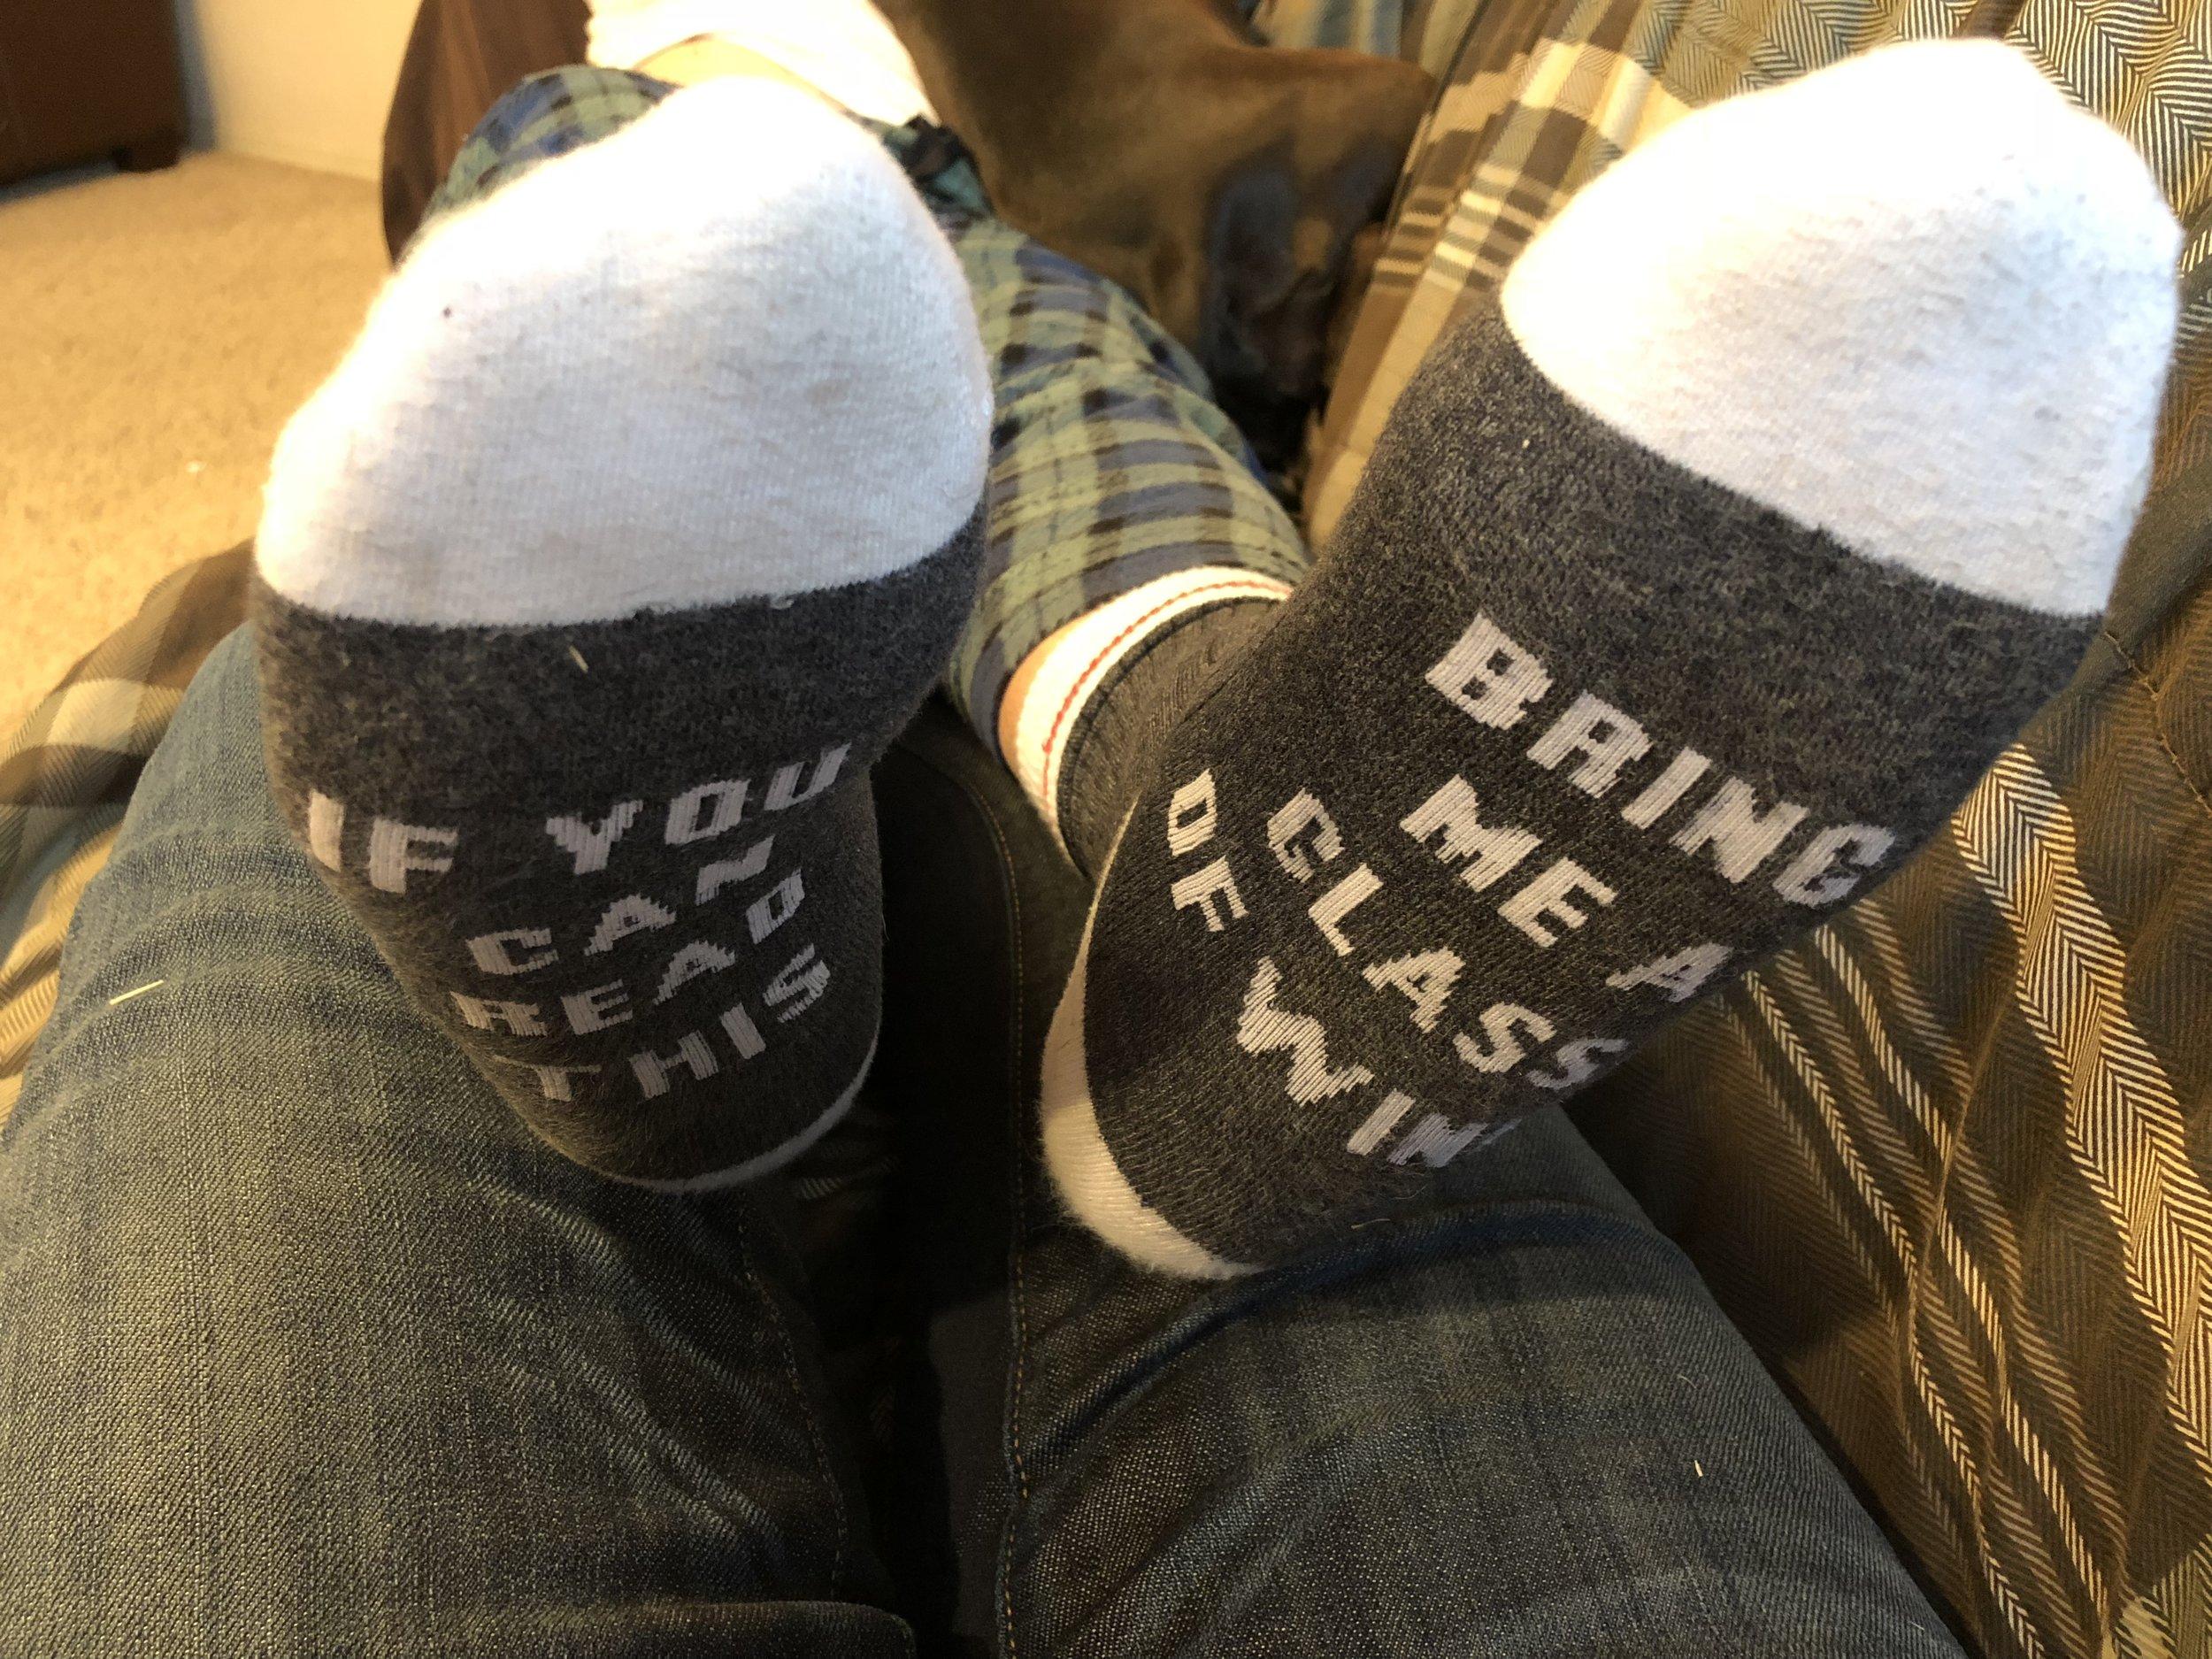 MY socks on my husband's feet.